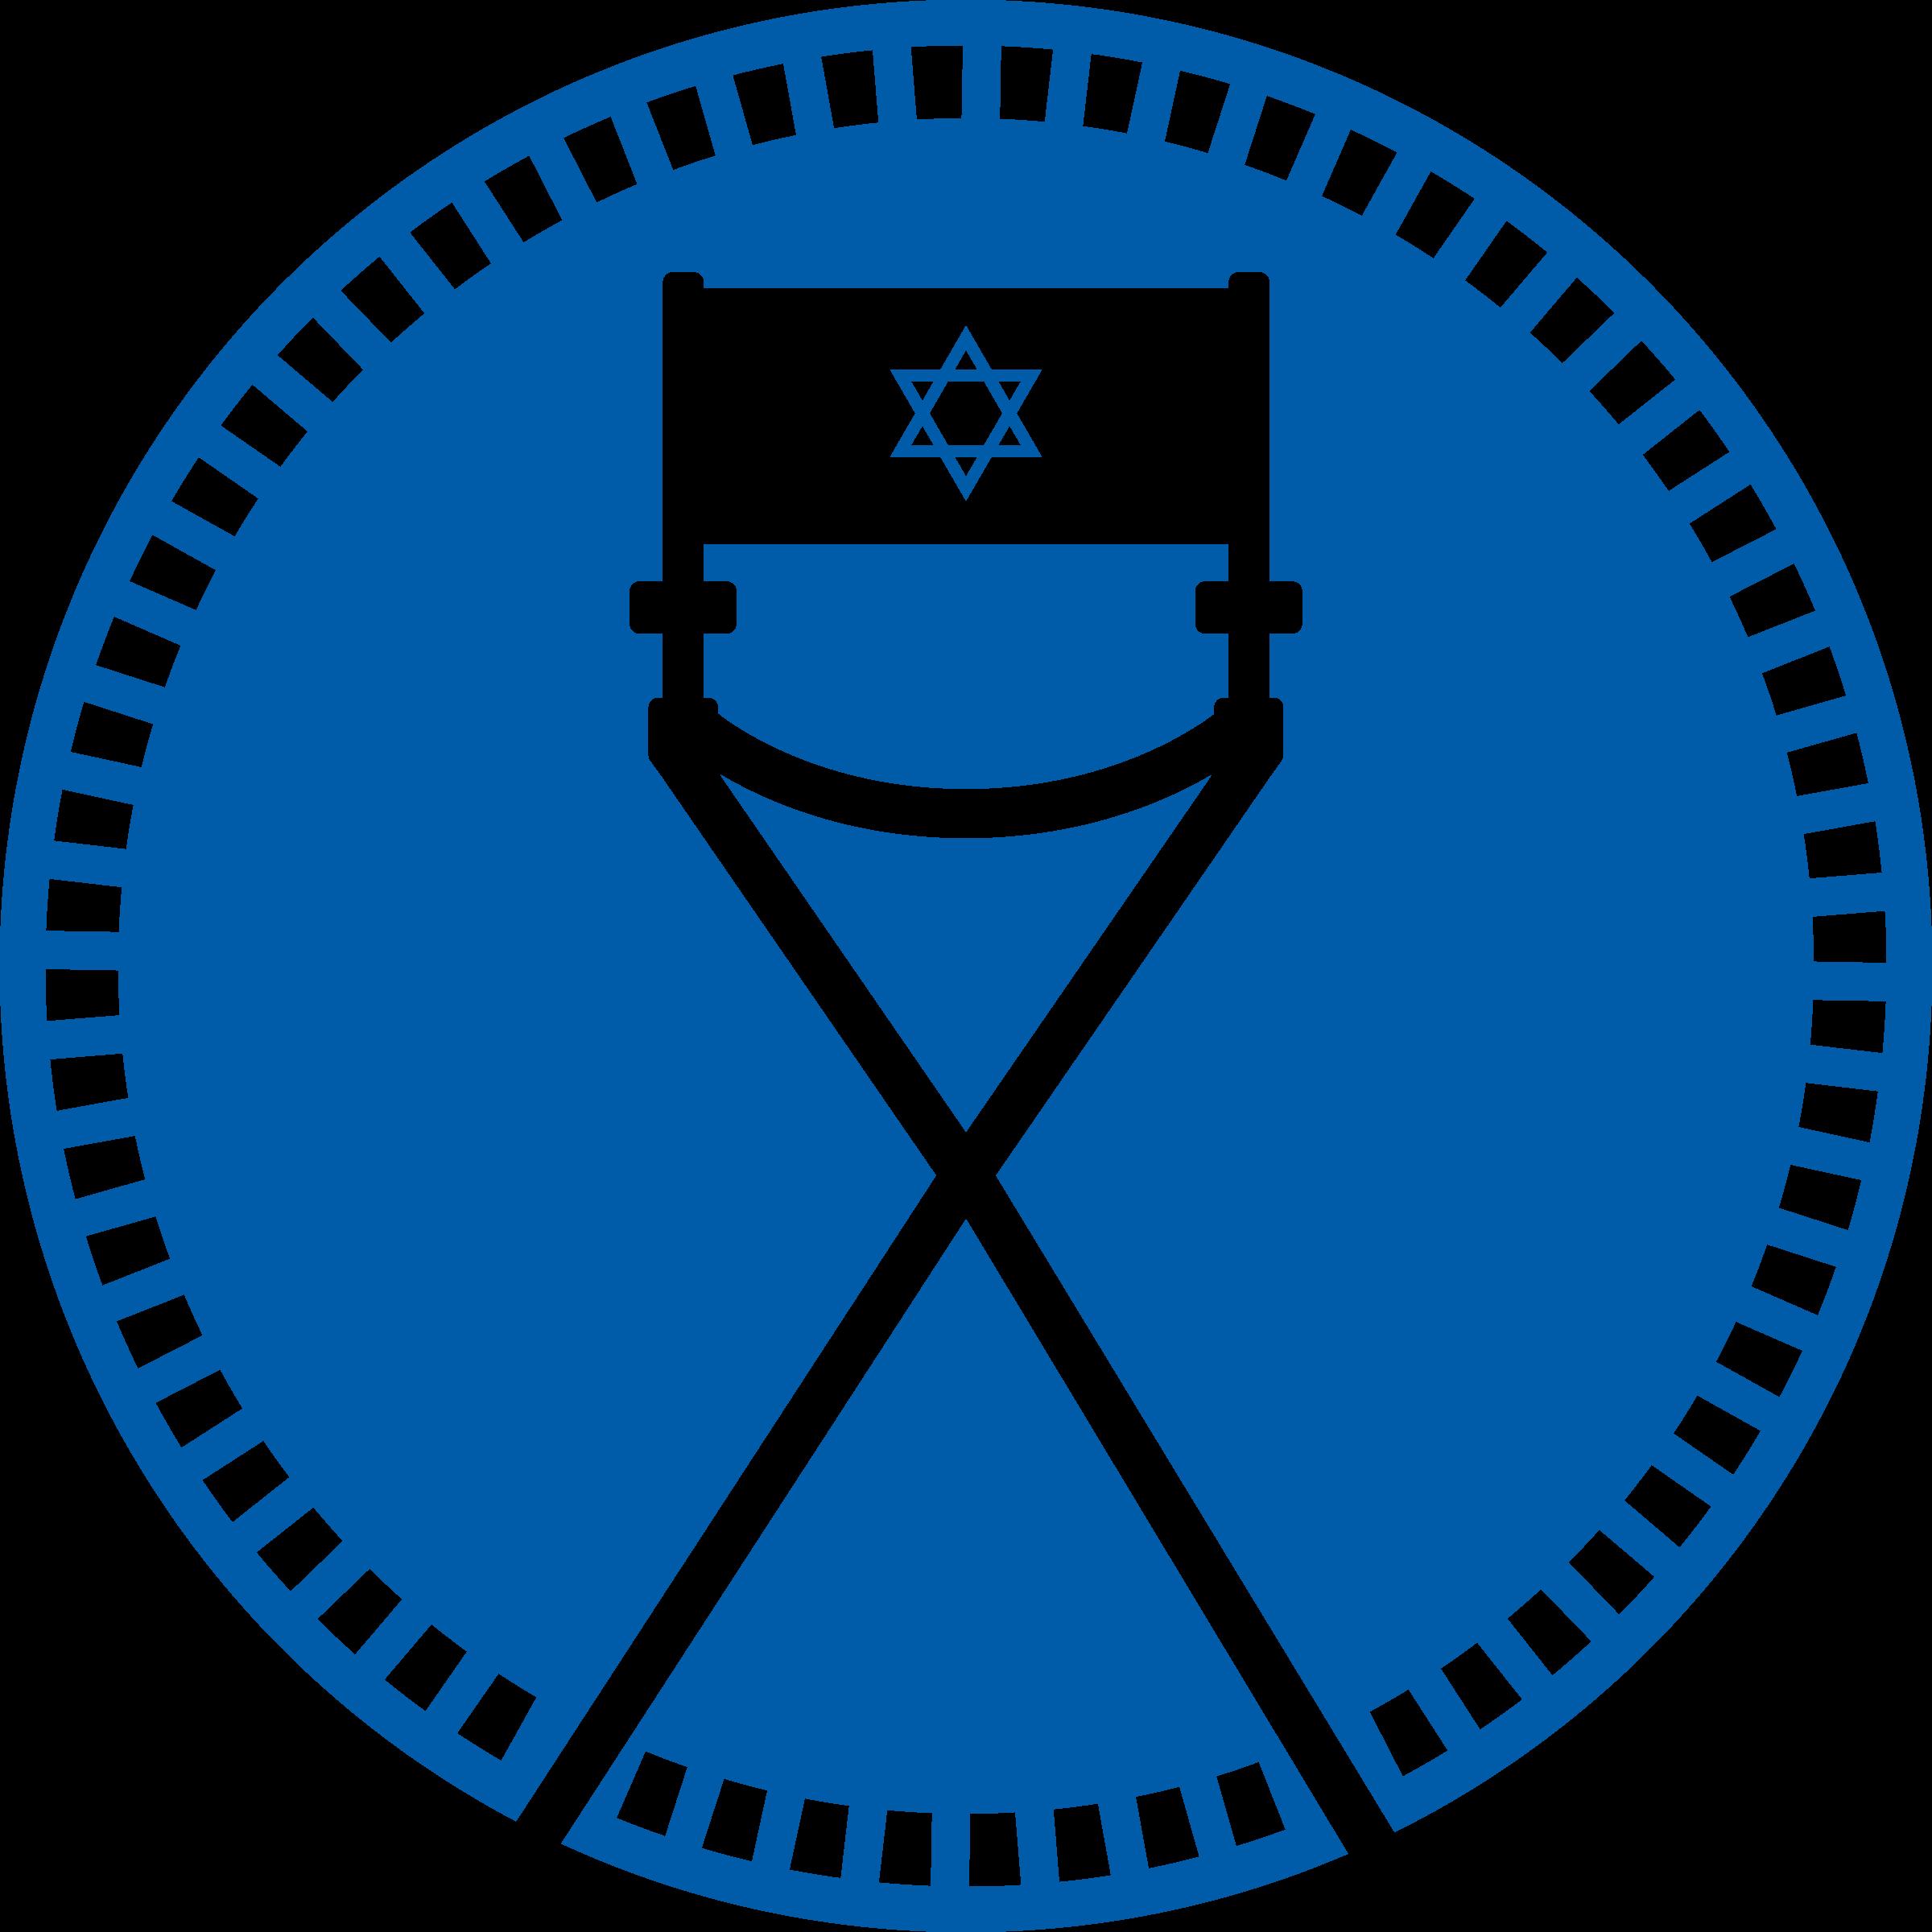 AJFF_Seal_Logo_Blue2.png